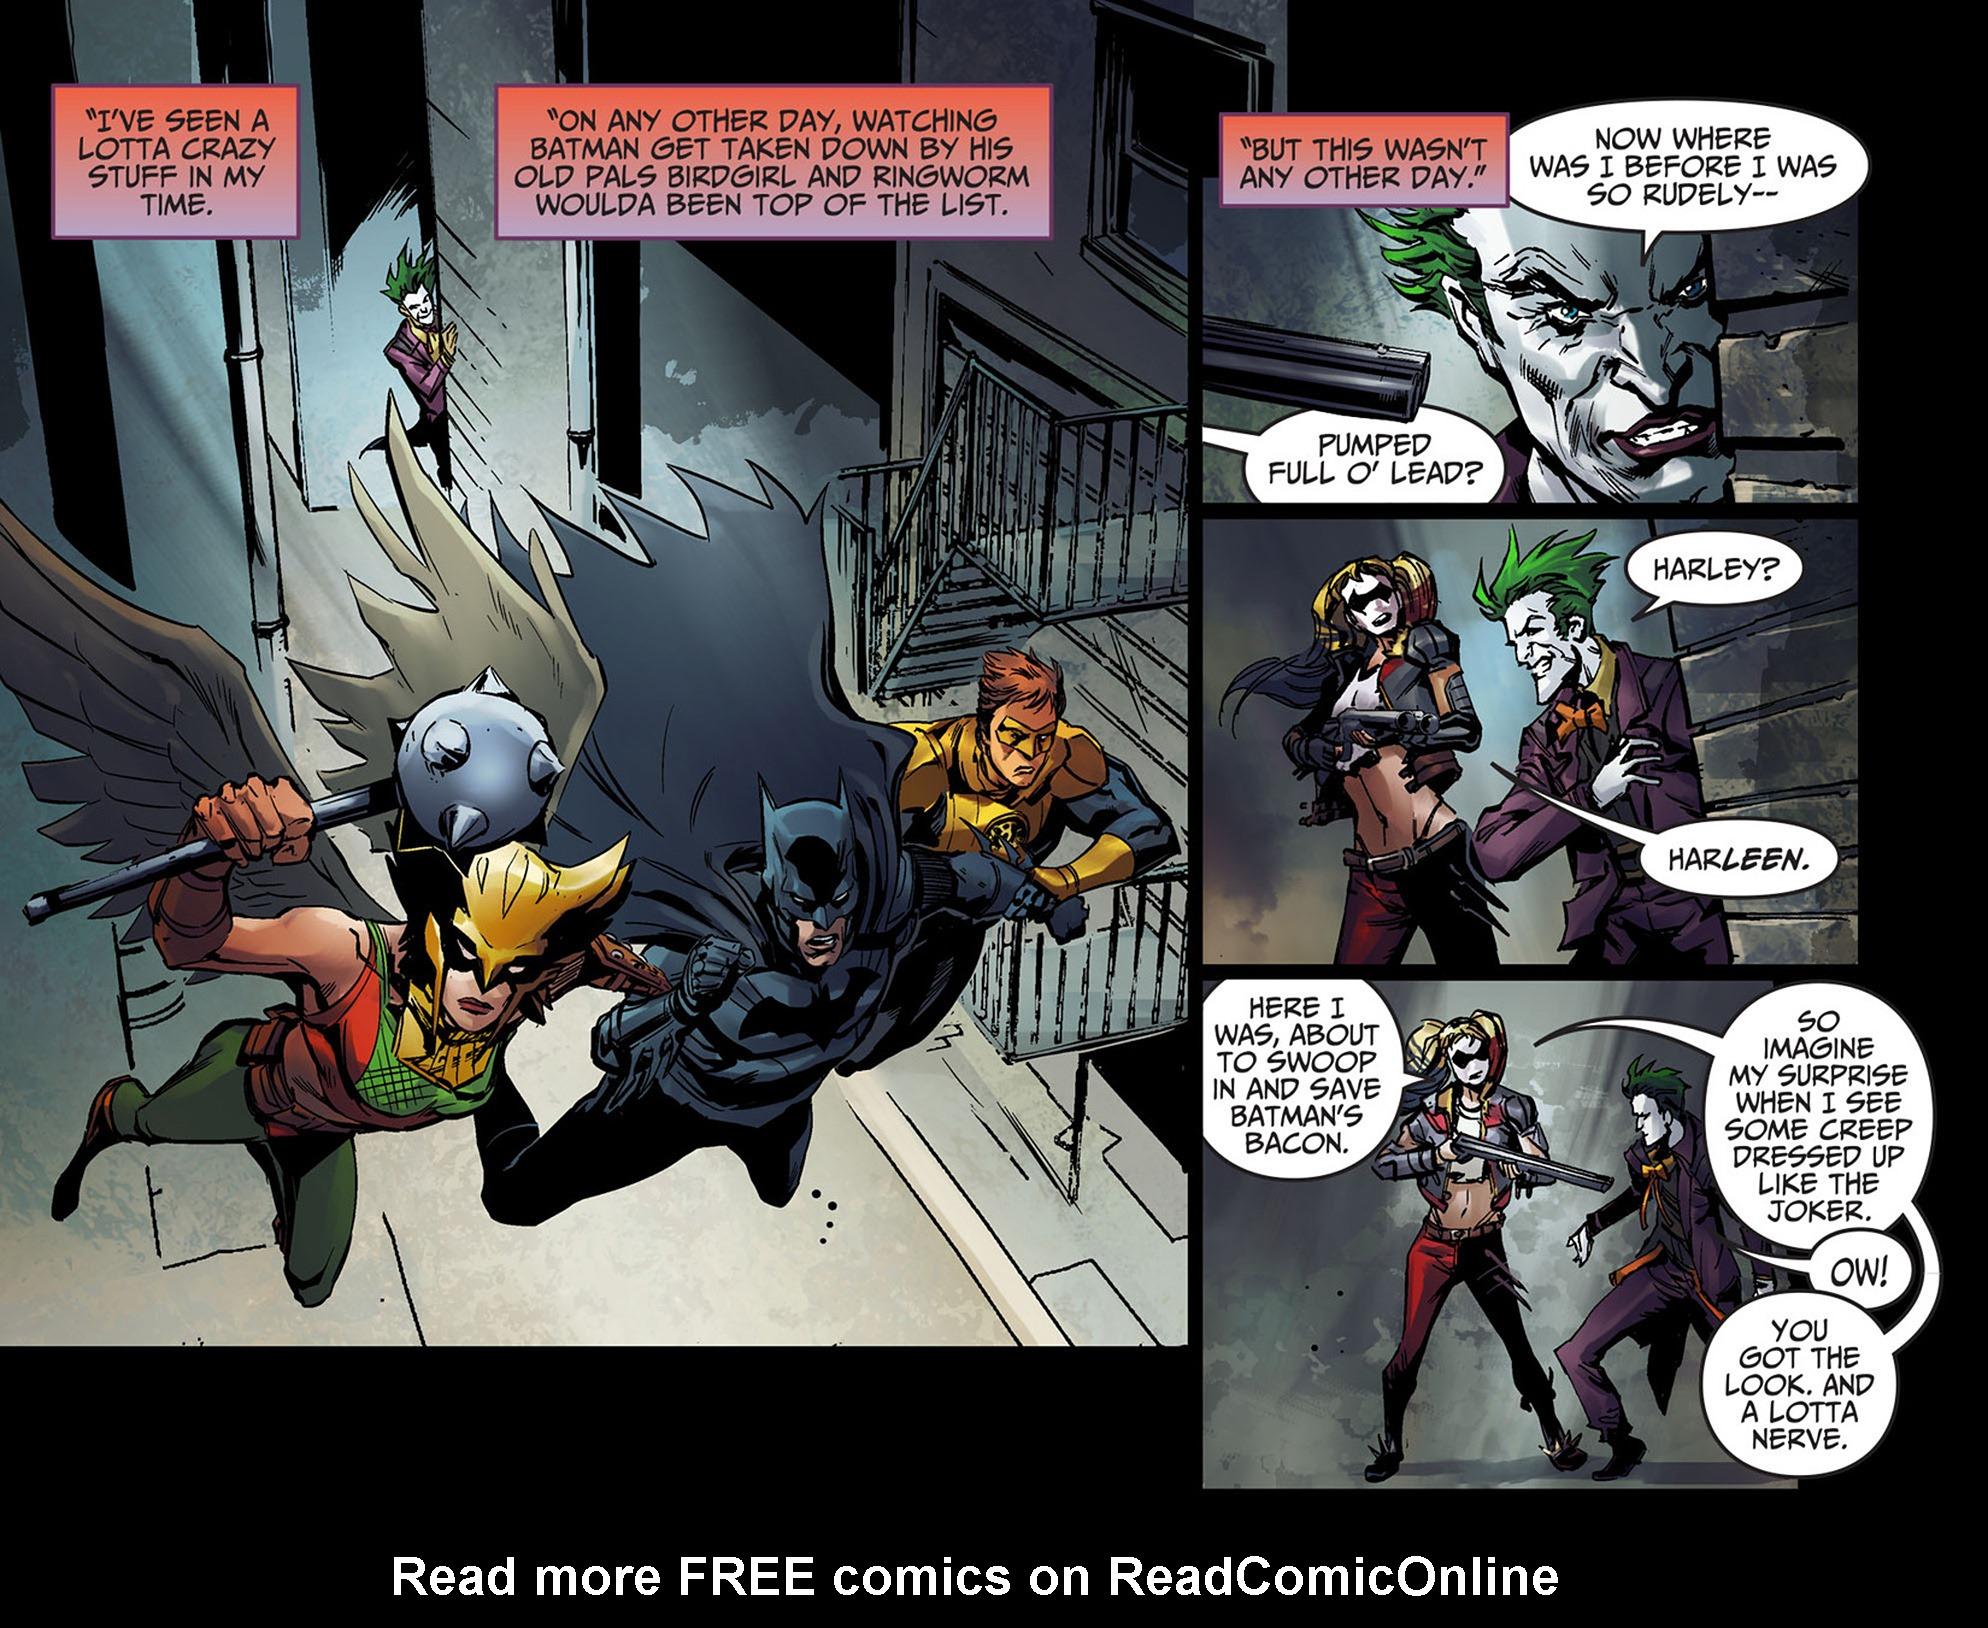 Read online Injustice: Ground Zero comic -  Issue #5 - 6